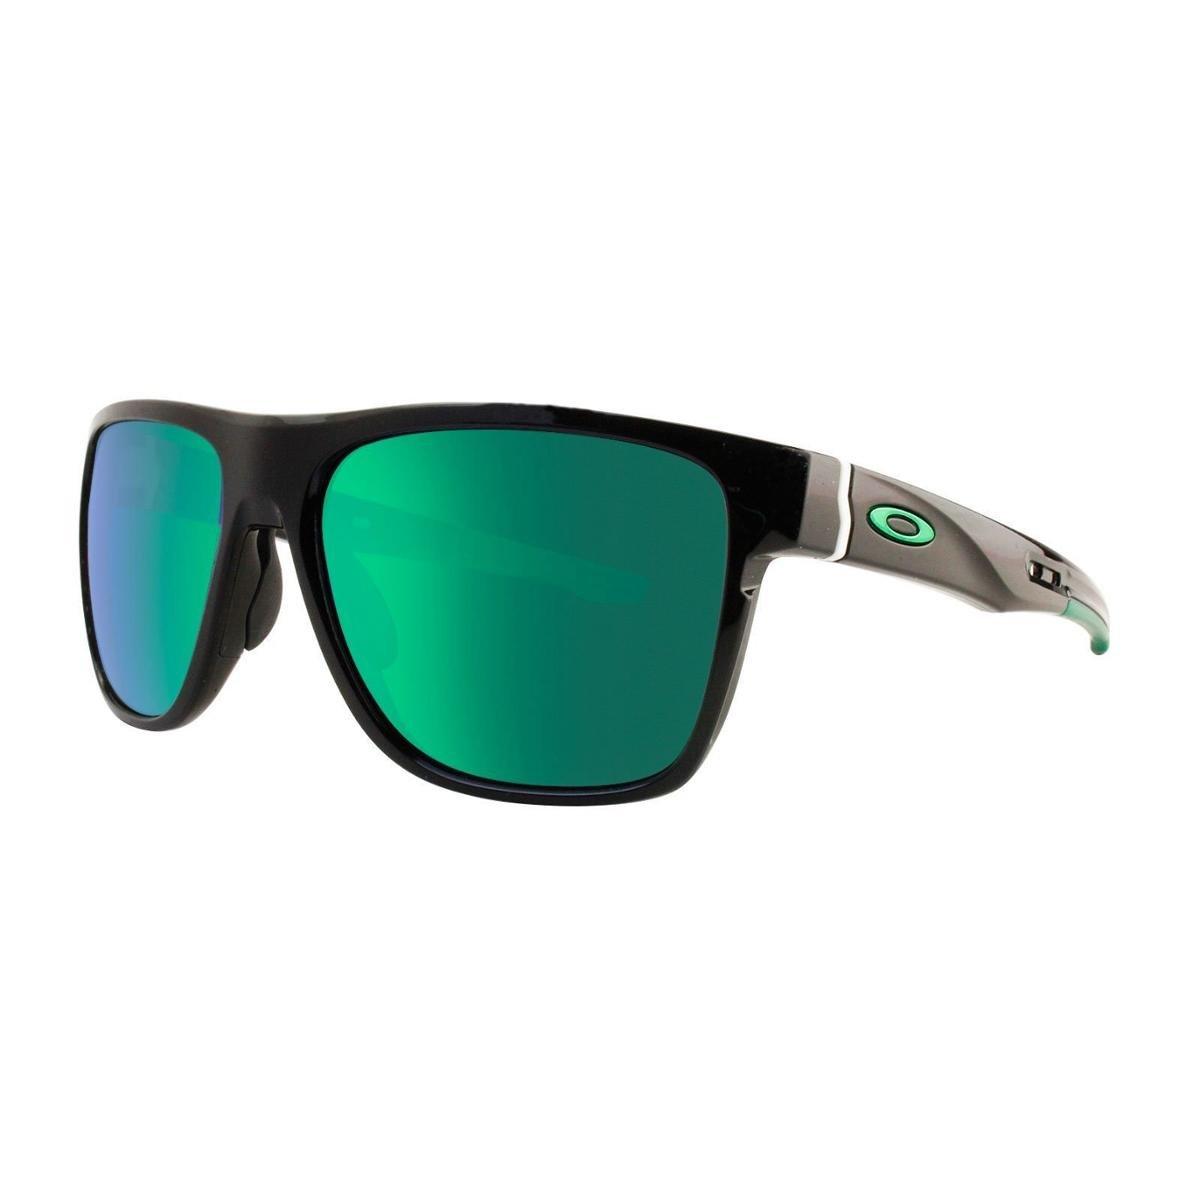 d584f3f0c7995 Óculos de Sol Oakley Crossrange XL OO9360 - Polished Black - Prizm Black  Polarized - Compre Agora